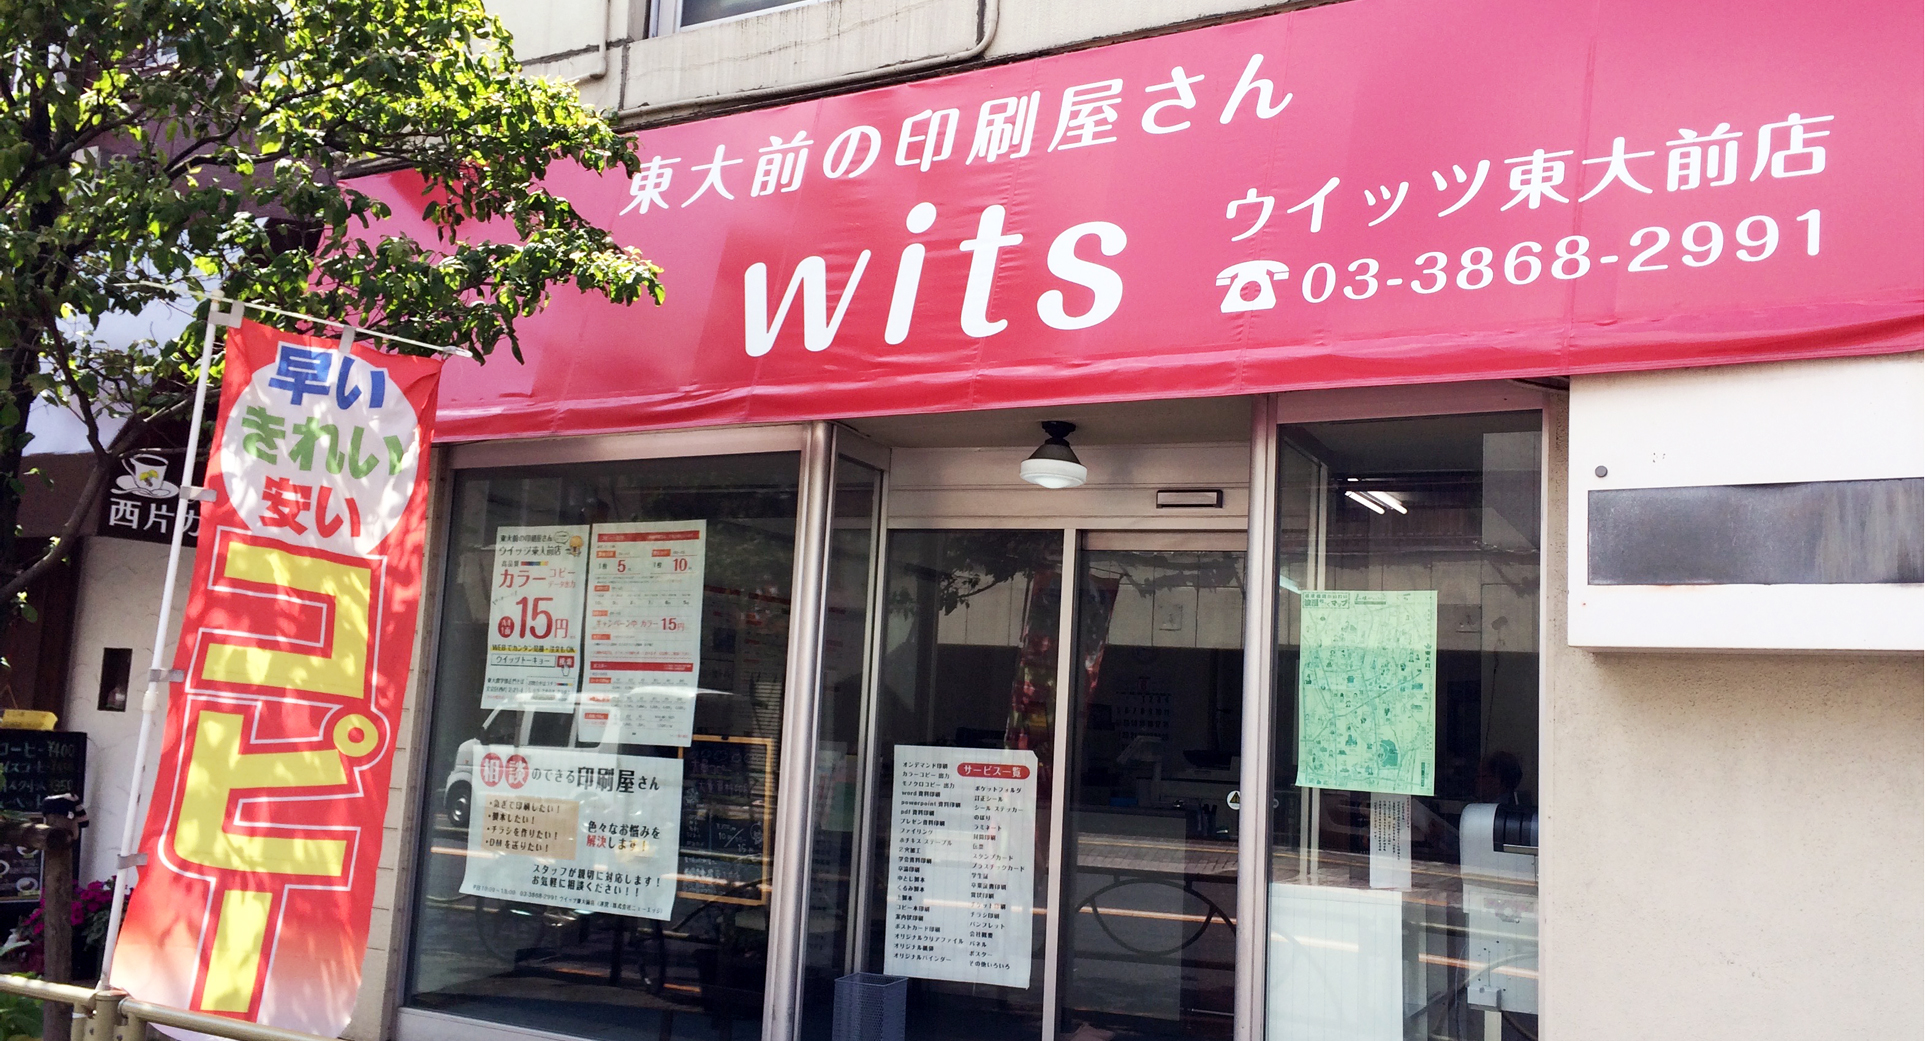 写真:ウイッツ本郷東大前店 店舗外観